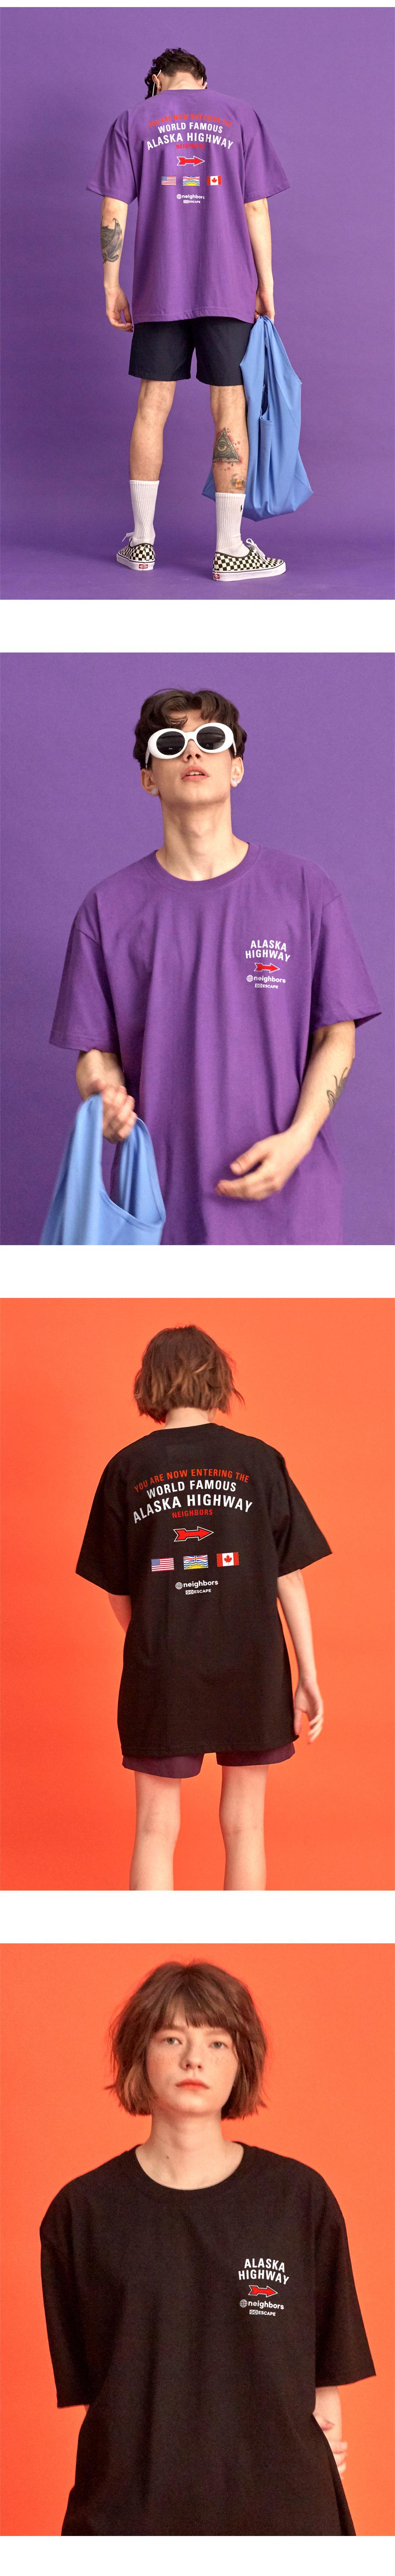 NBS304 알래스카 하이웨이 반팔 티셔츠 - 3컬러